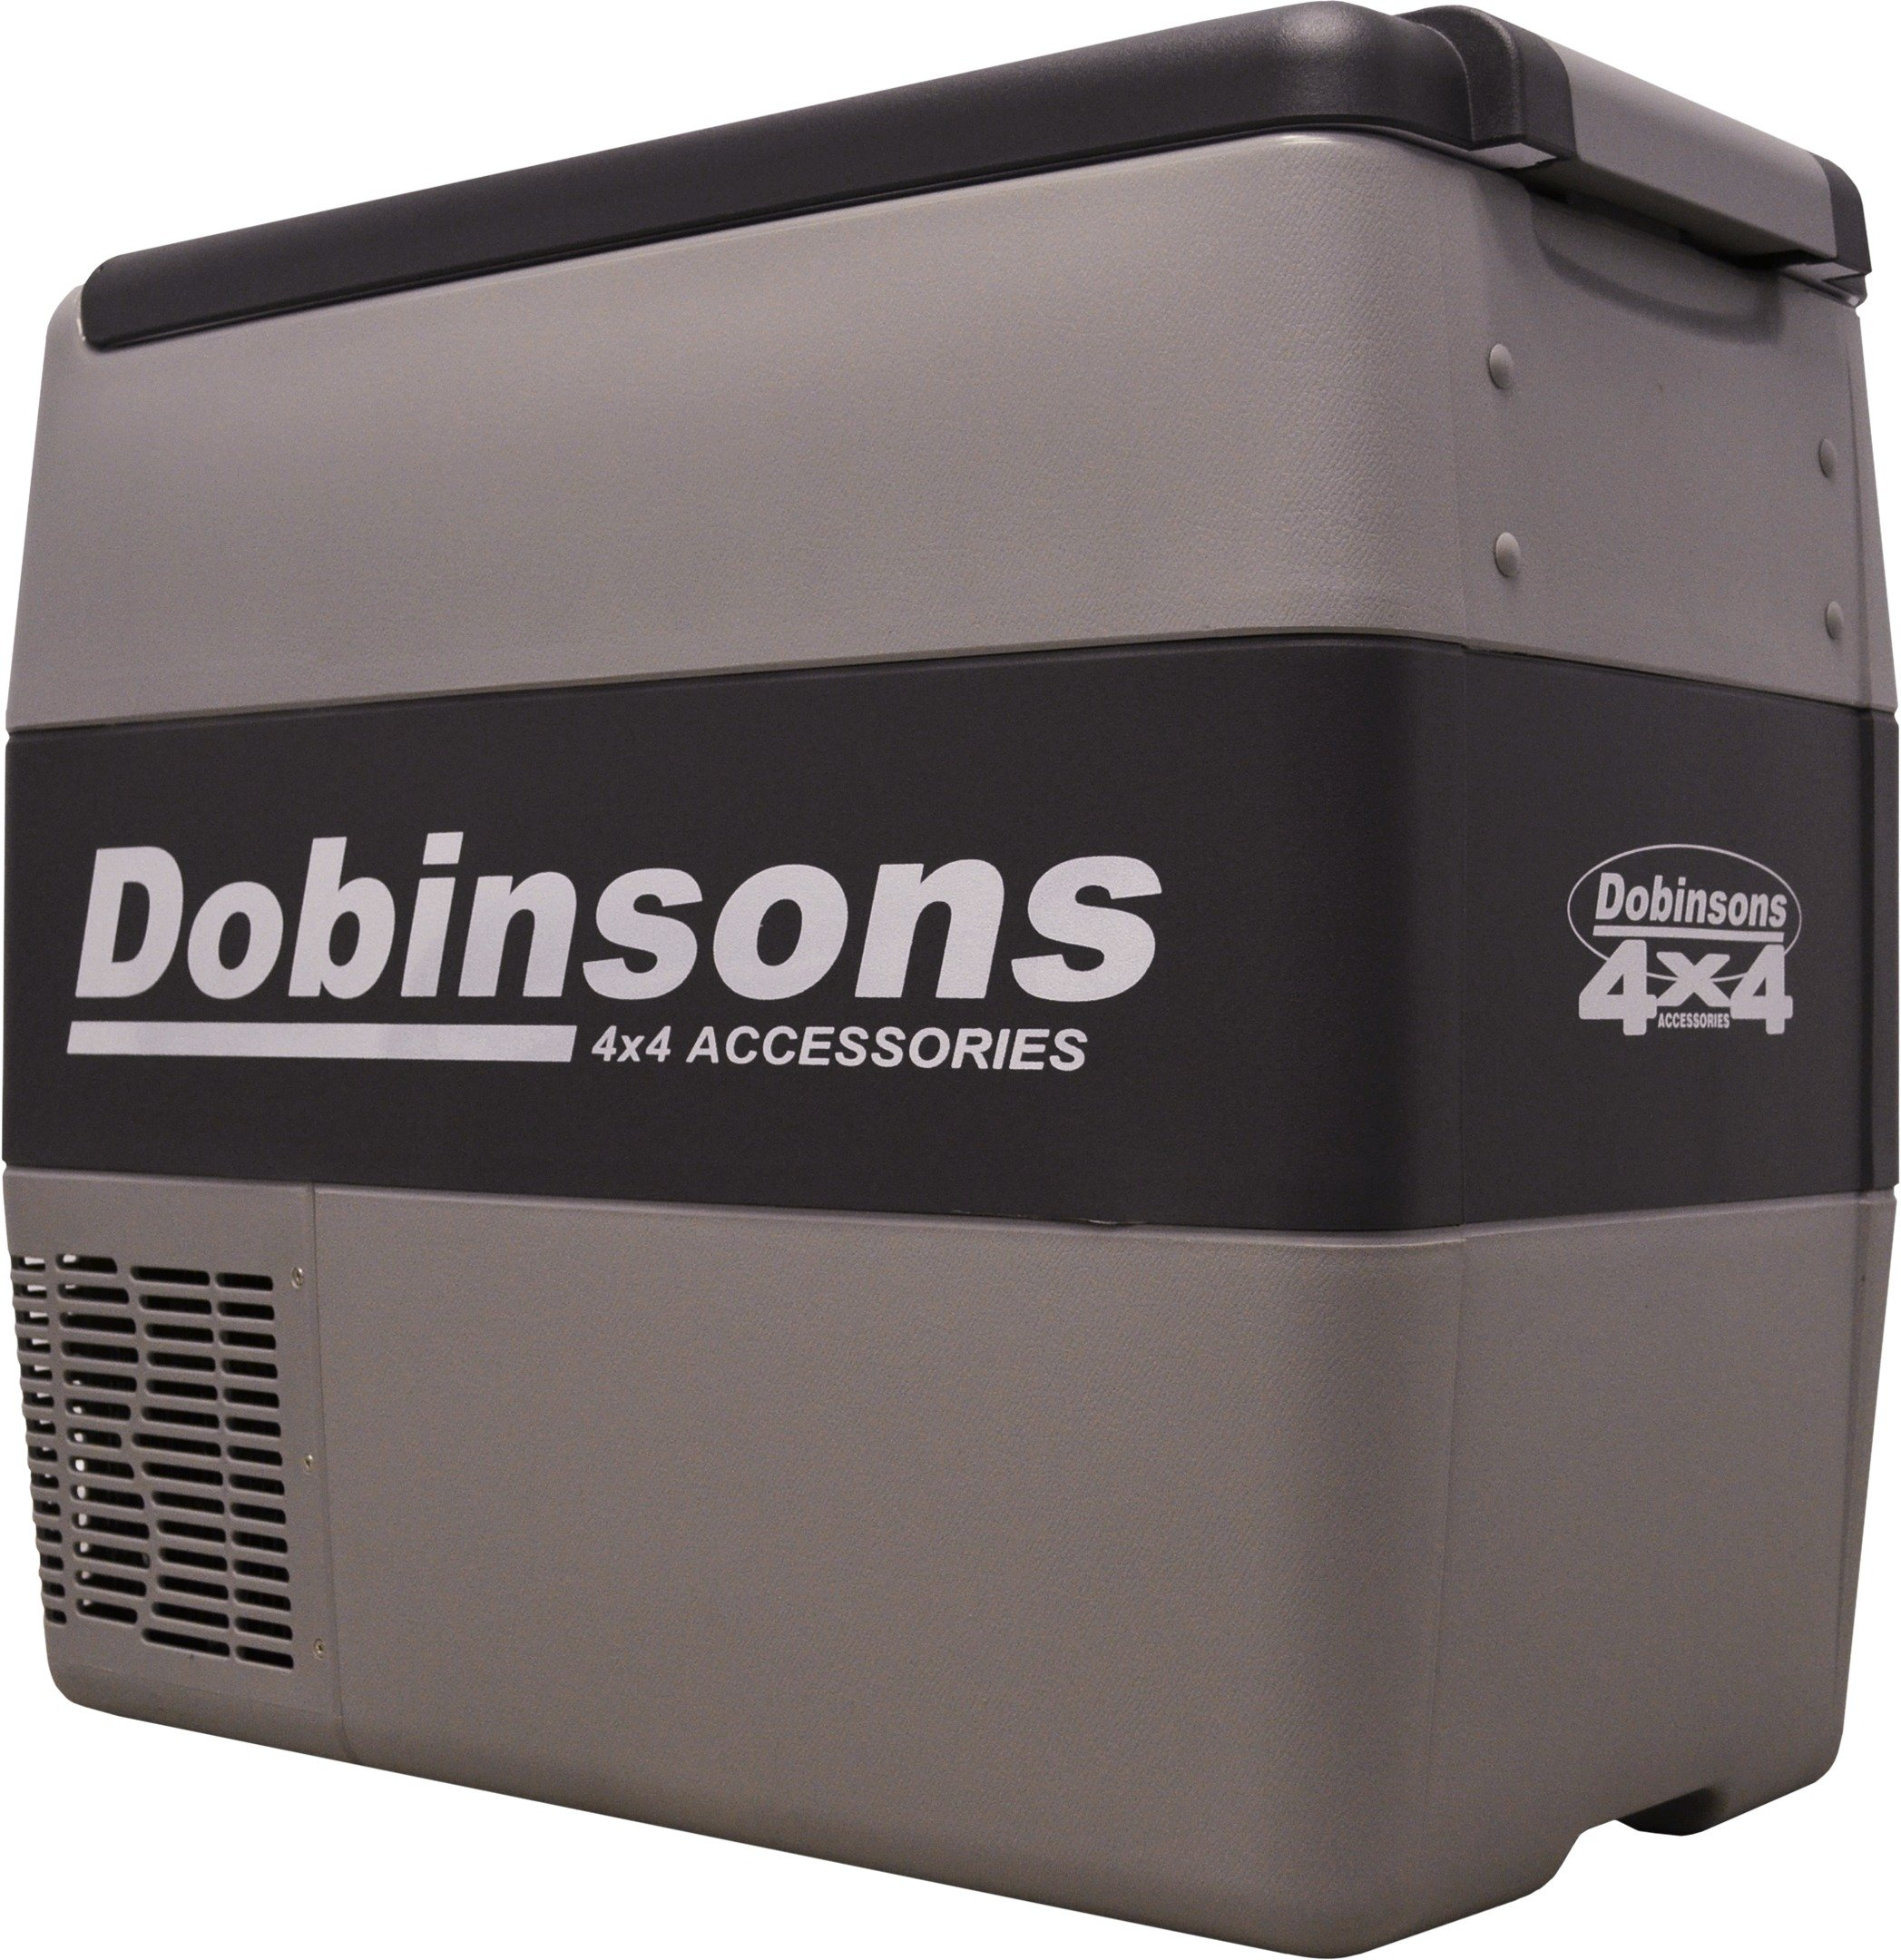 Dobinsons 4x4 50 Liter 12V Portable Fridge Freezer, Includes Free Insulating Cover Bag